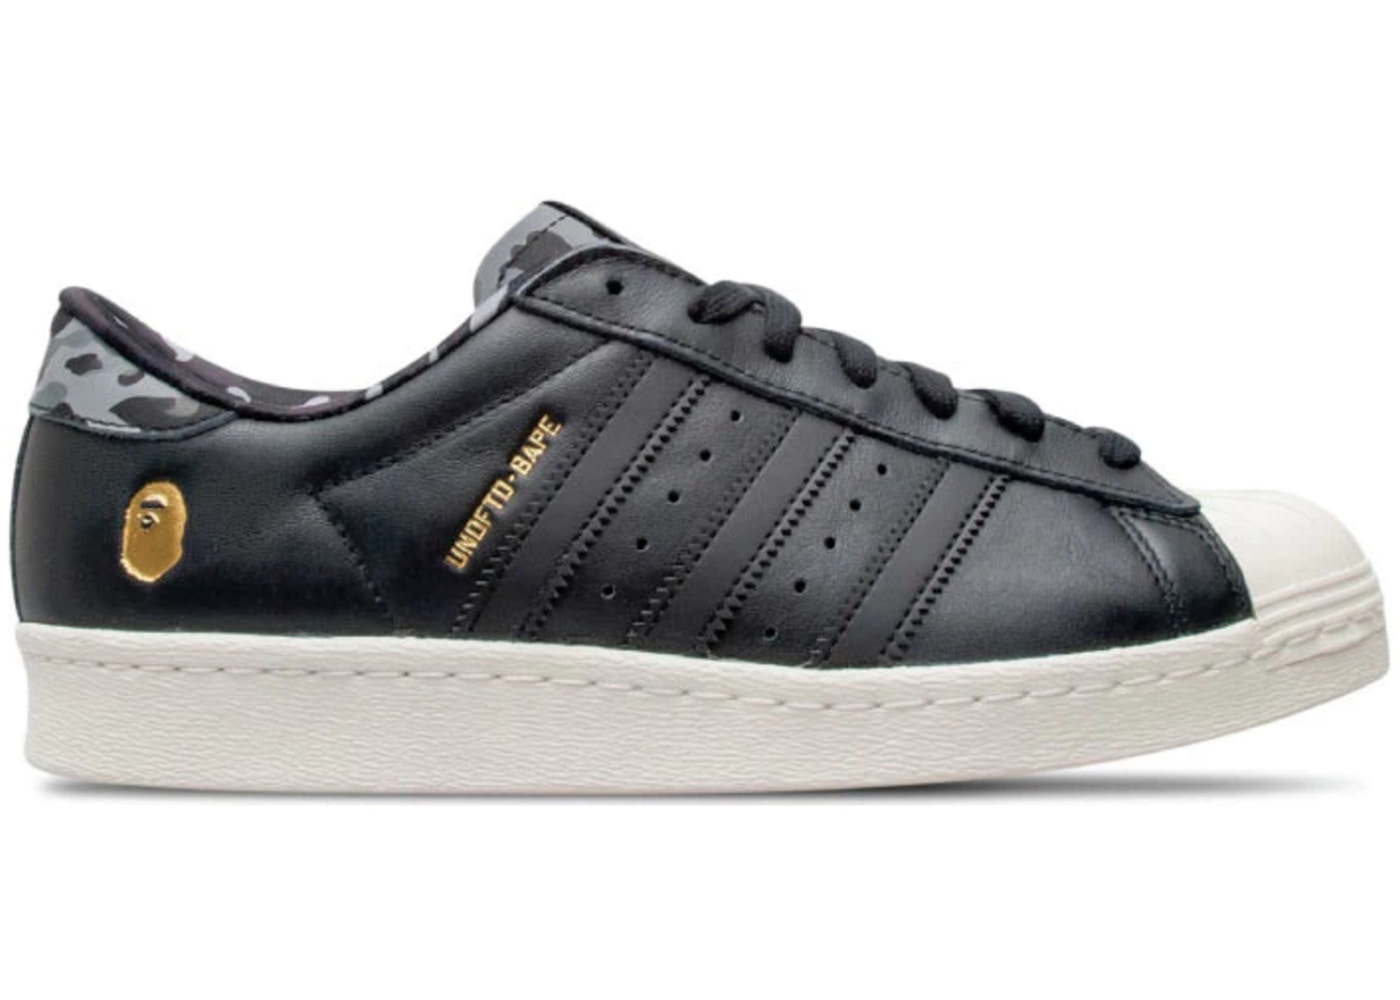 c82af4ae adidas Superstar 80s Undftd Bape Black - B34291